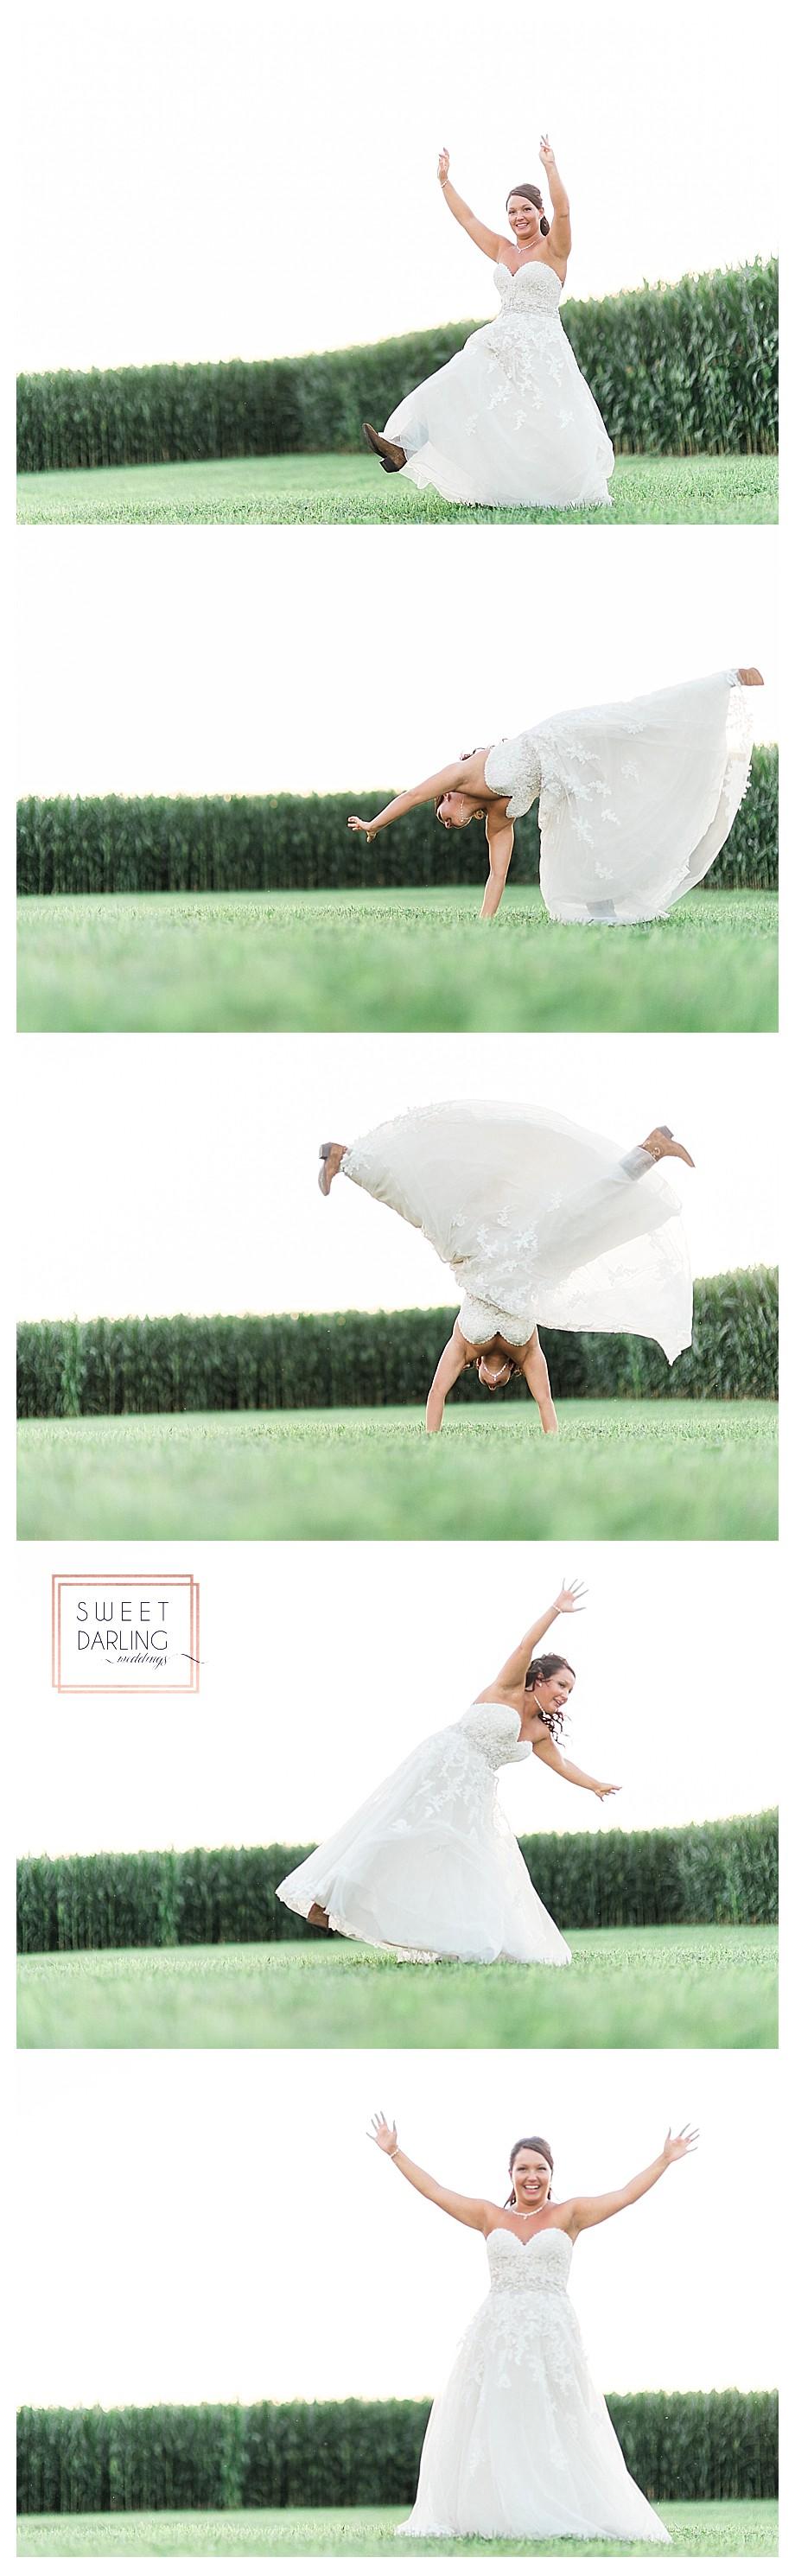 bride former cheerleader does cartwheels in wedding dress